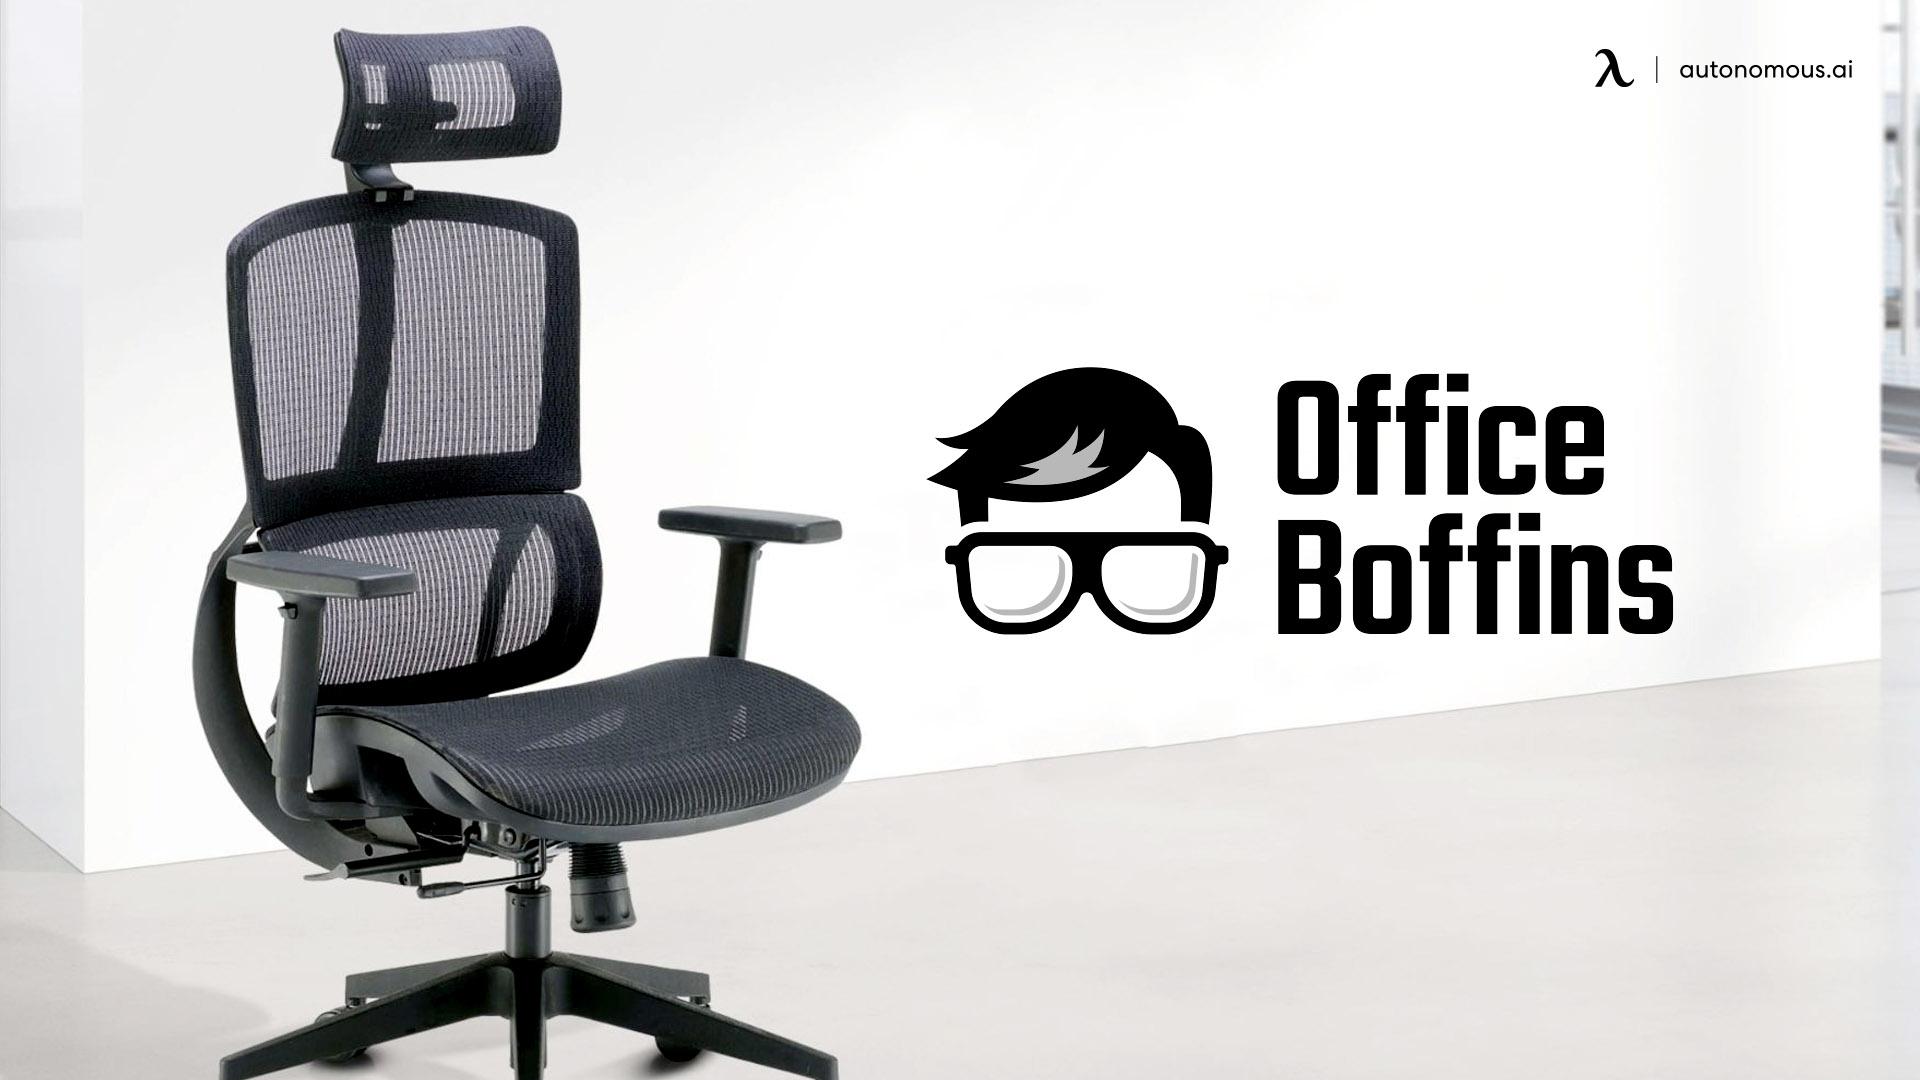 Office Boffins